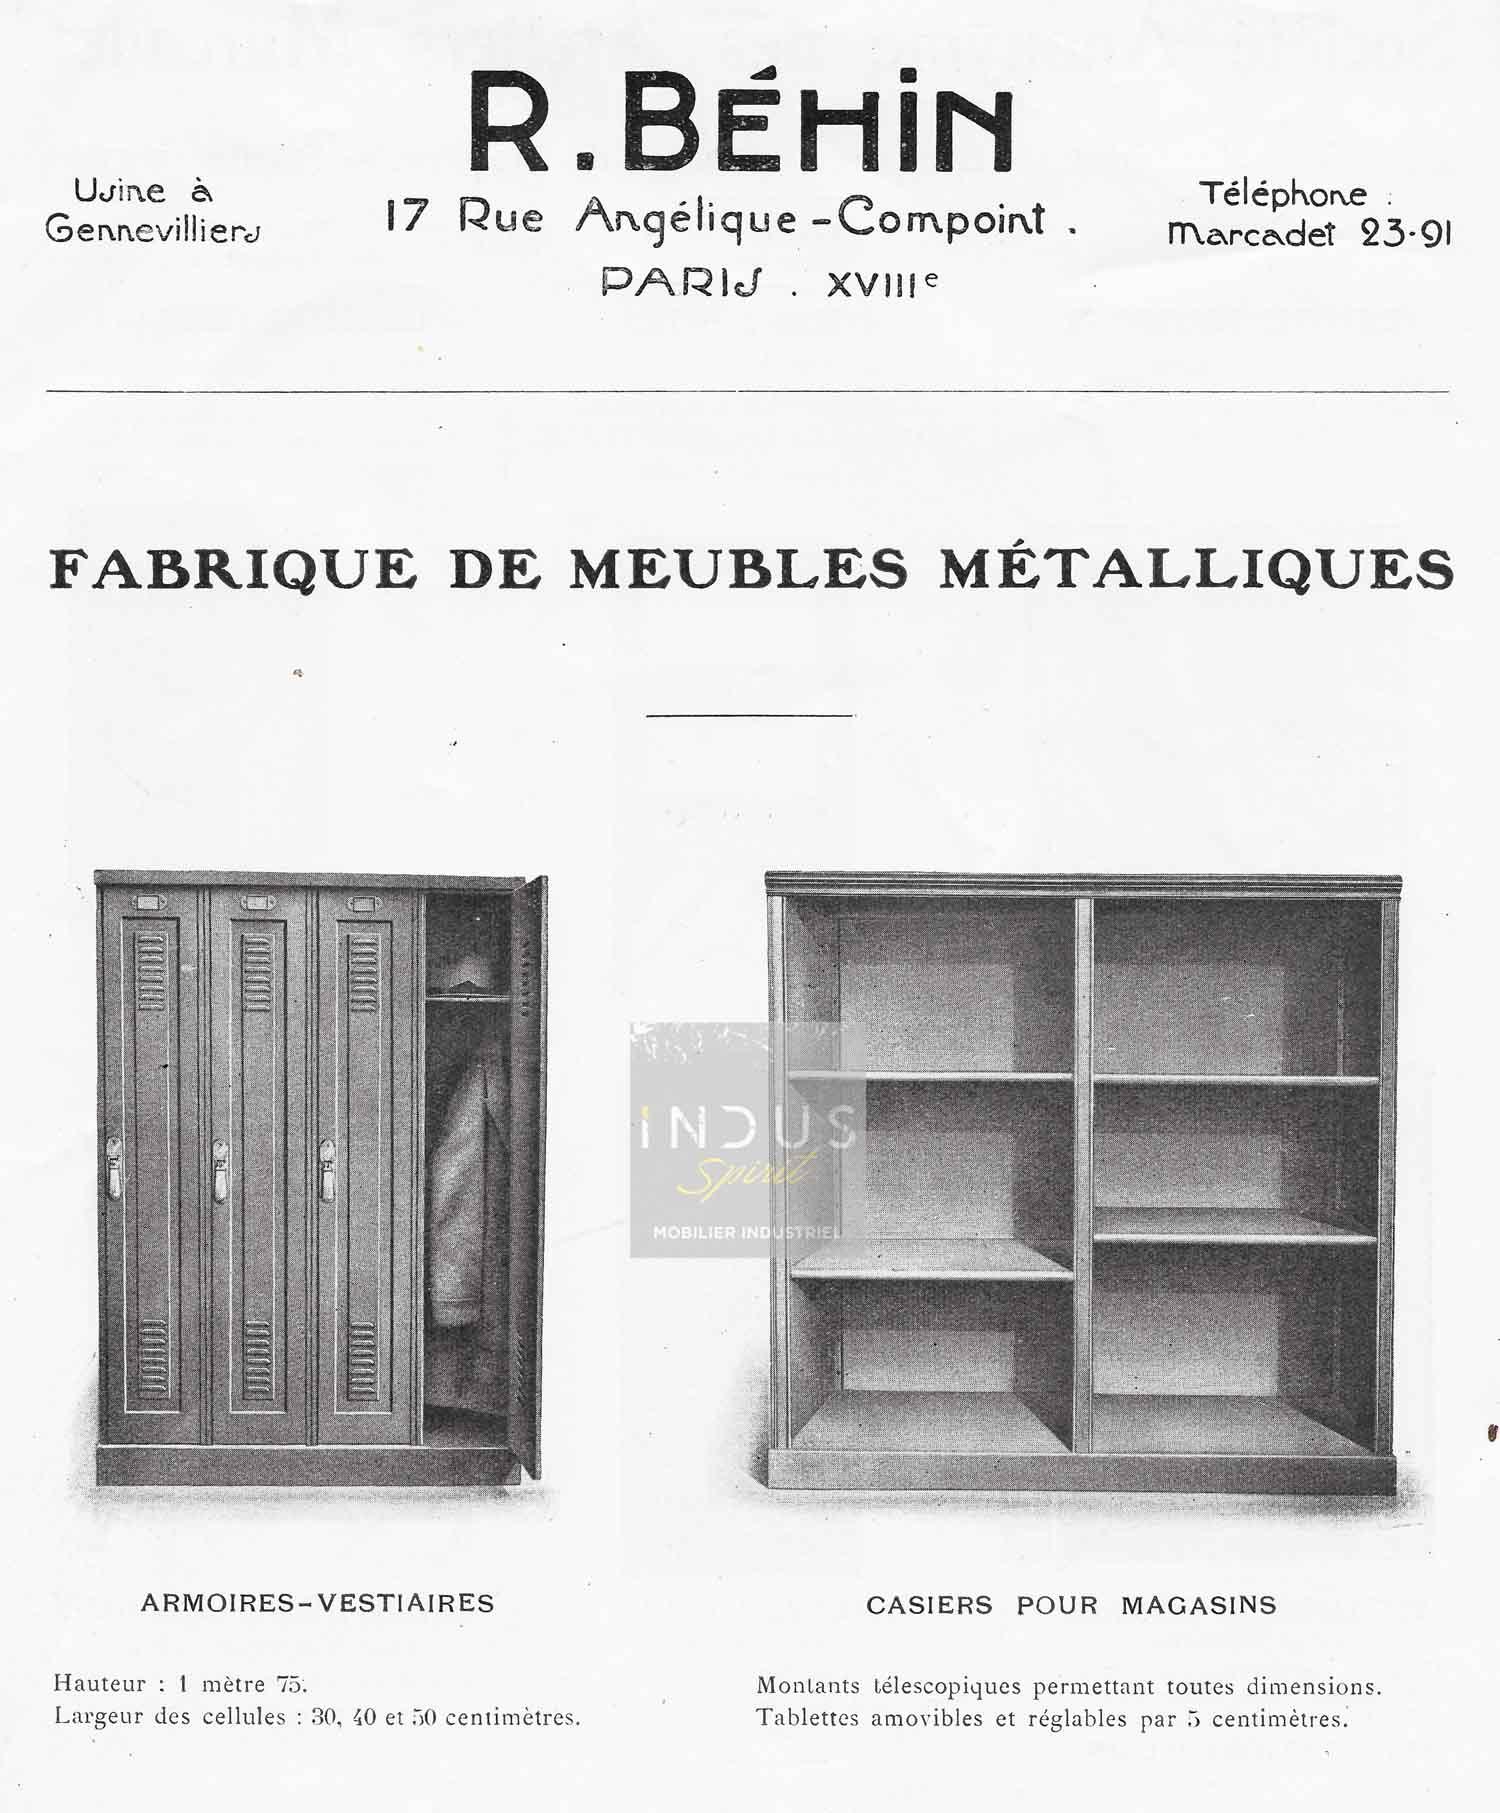 meuble-métallique-behin.jpg